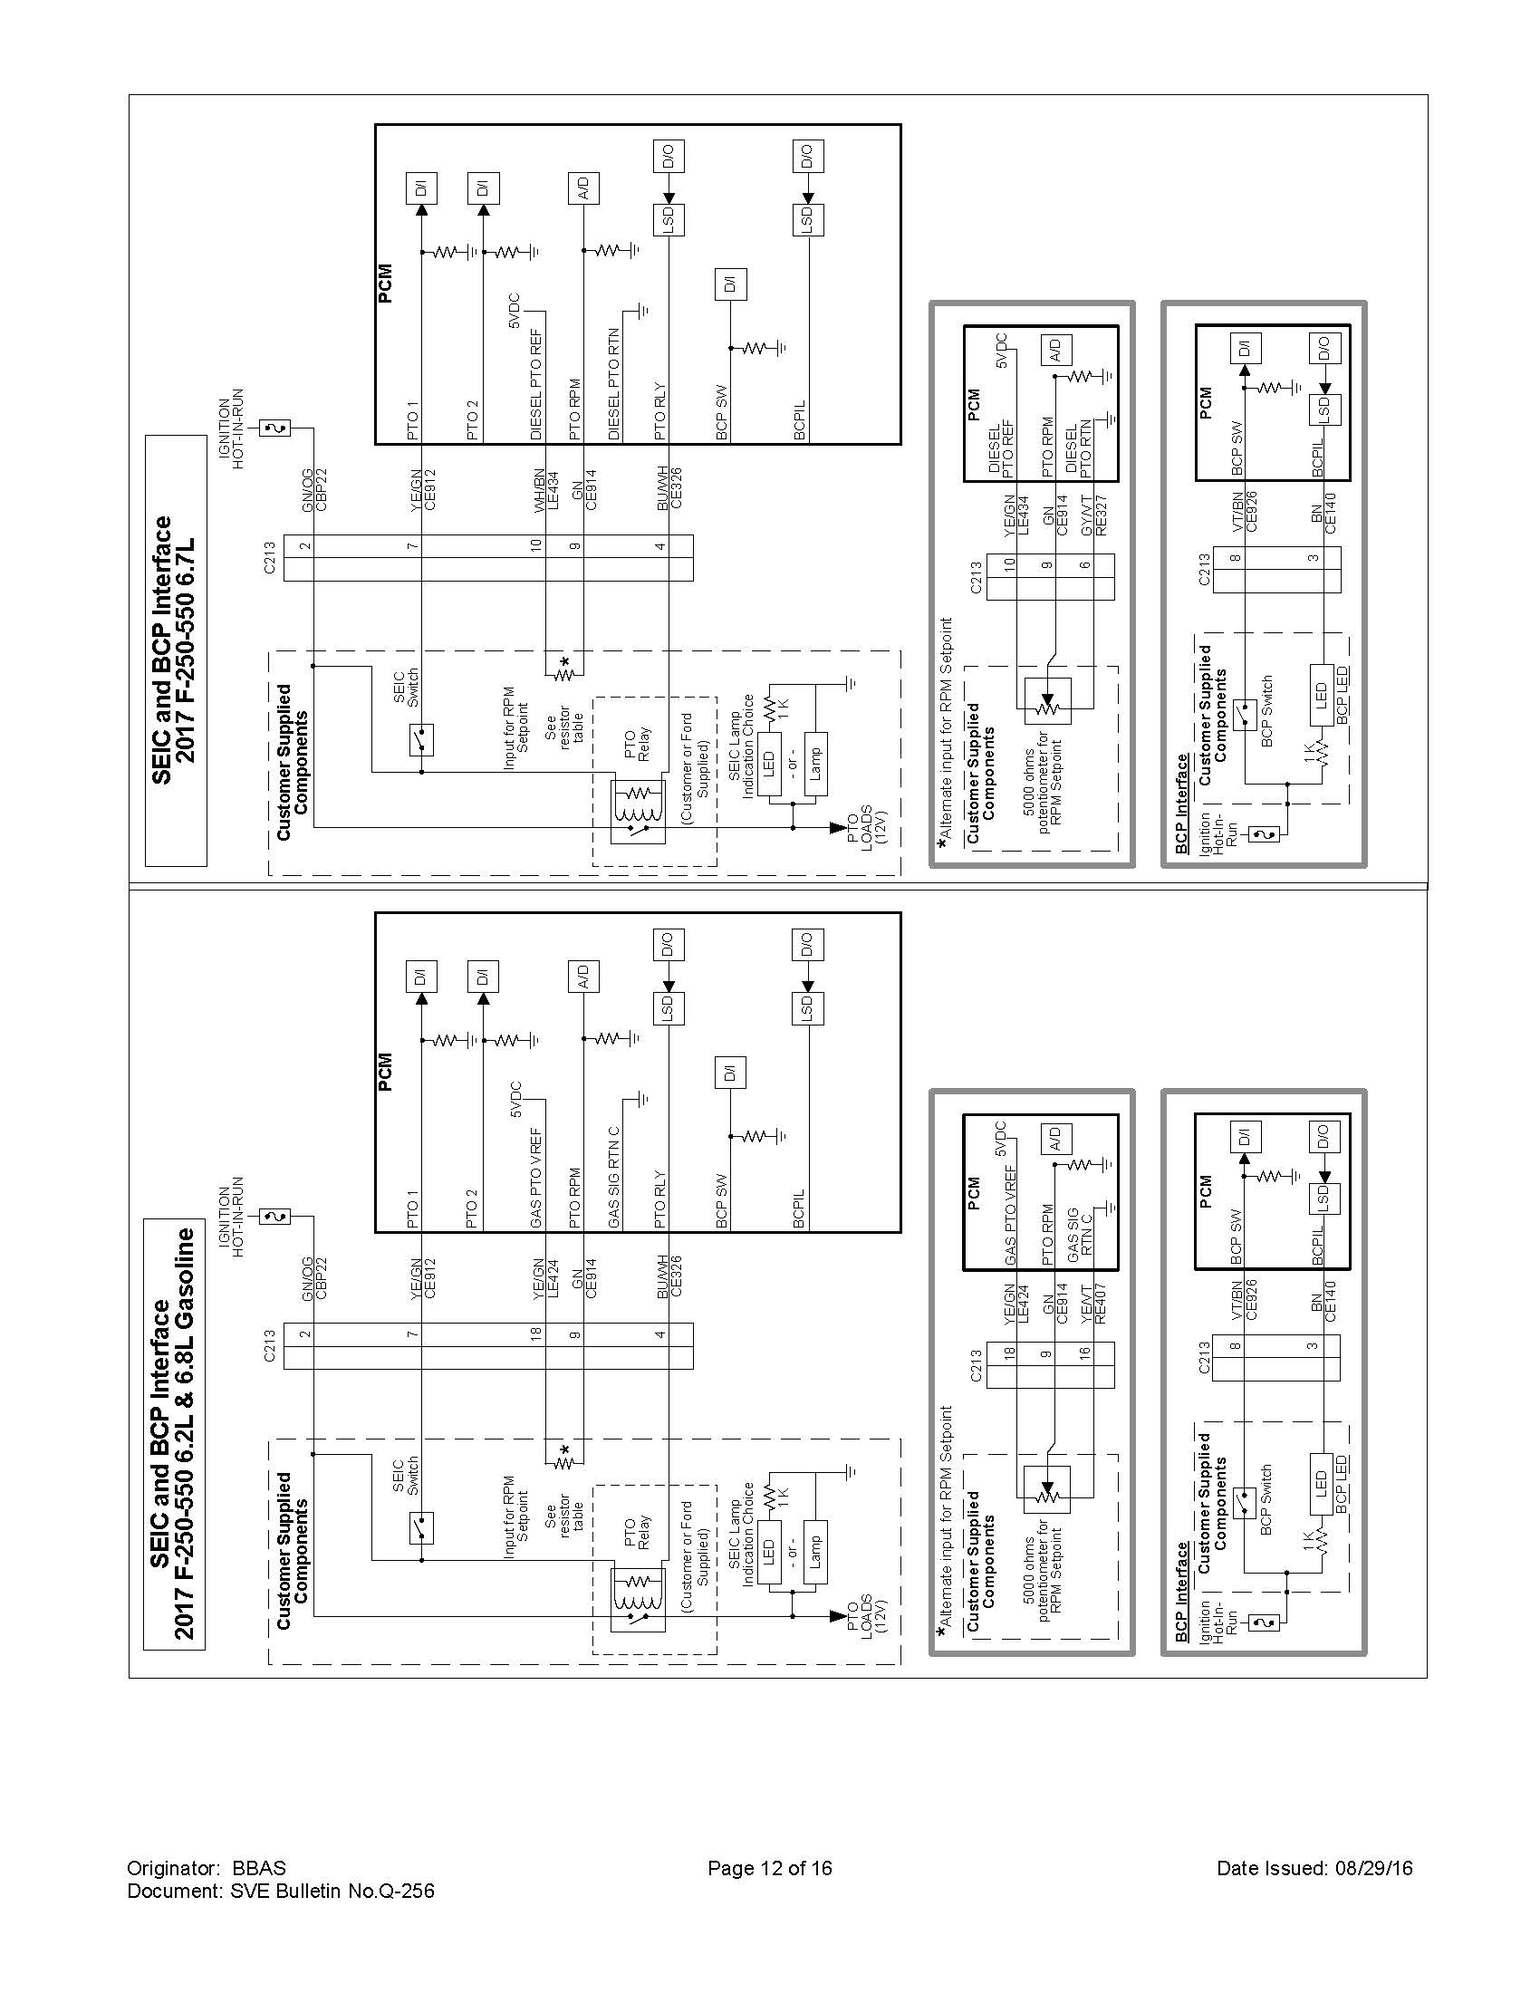 Ford F550 Pto Wiring Diagram - Wiring Liry Diagram A4  F Wiring Diagrams on 2001 fuel system diagram, 2001 fuse diagram, 2001 transmission diagram, 2001 parts diagram, 2001 steering diagram,